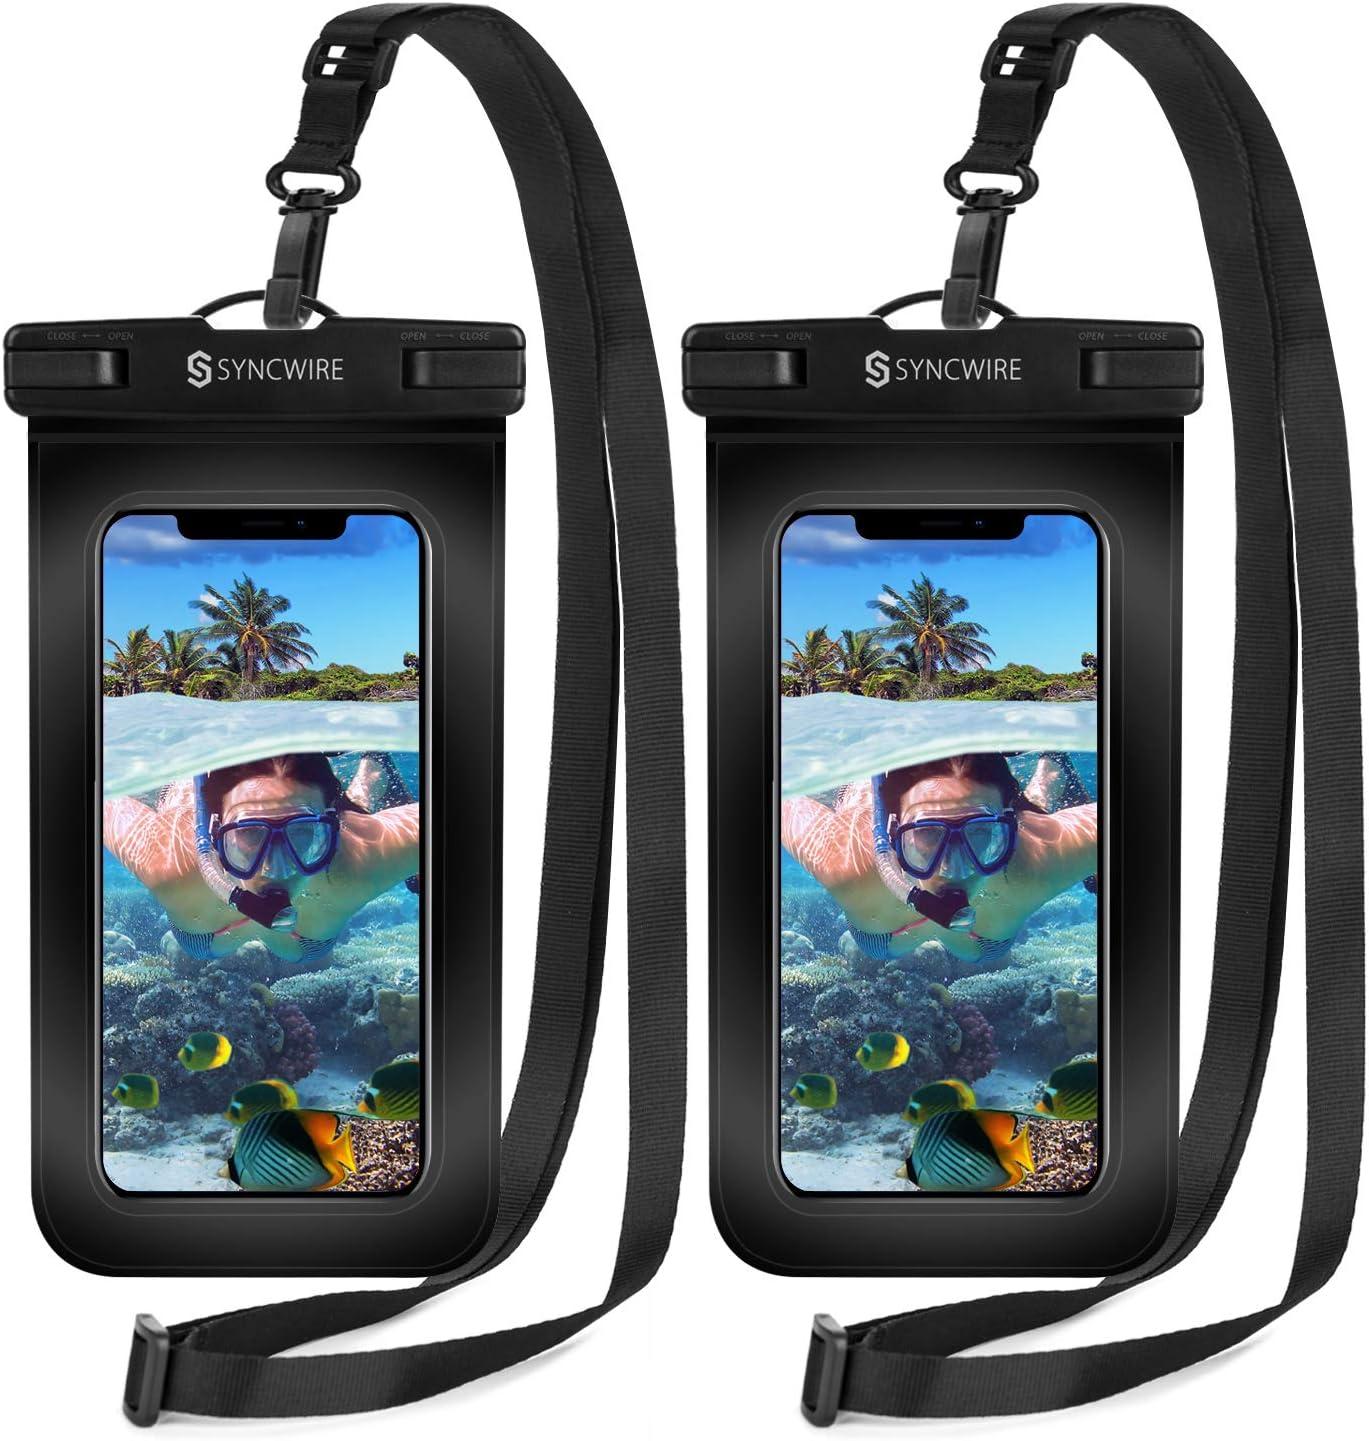 Syncwire Funda Impermeable Universal, 2 Unidades Bolsa para móvil estanca a Prueba de Agua IPX8 para iPhone XS MAX XR XS X 8 7 6 Plus se 5s, Xiaomi Redmi Note 7 Pro, Galaxy S10+ S9 S8, Huawei P30 Pro